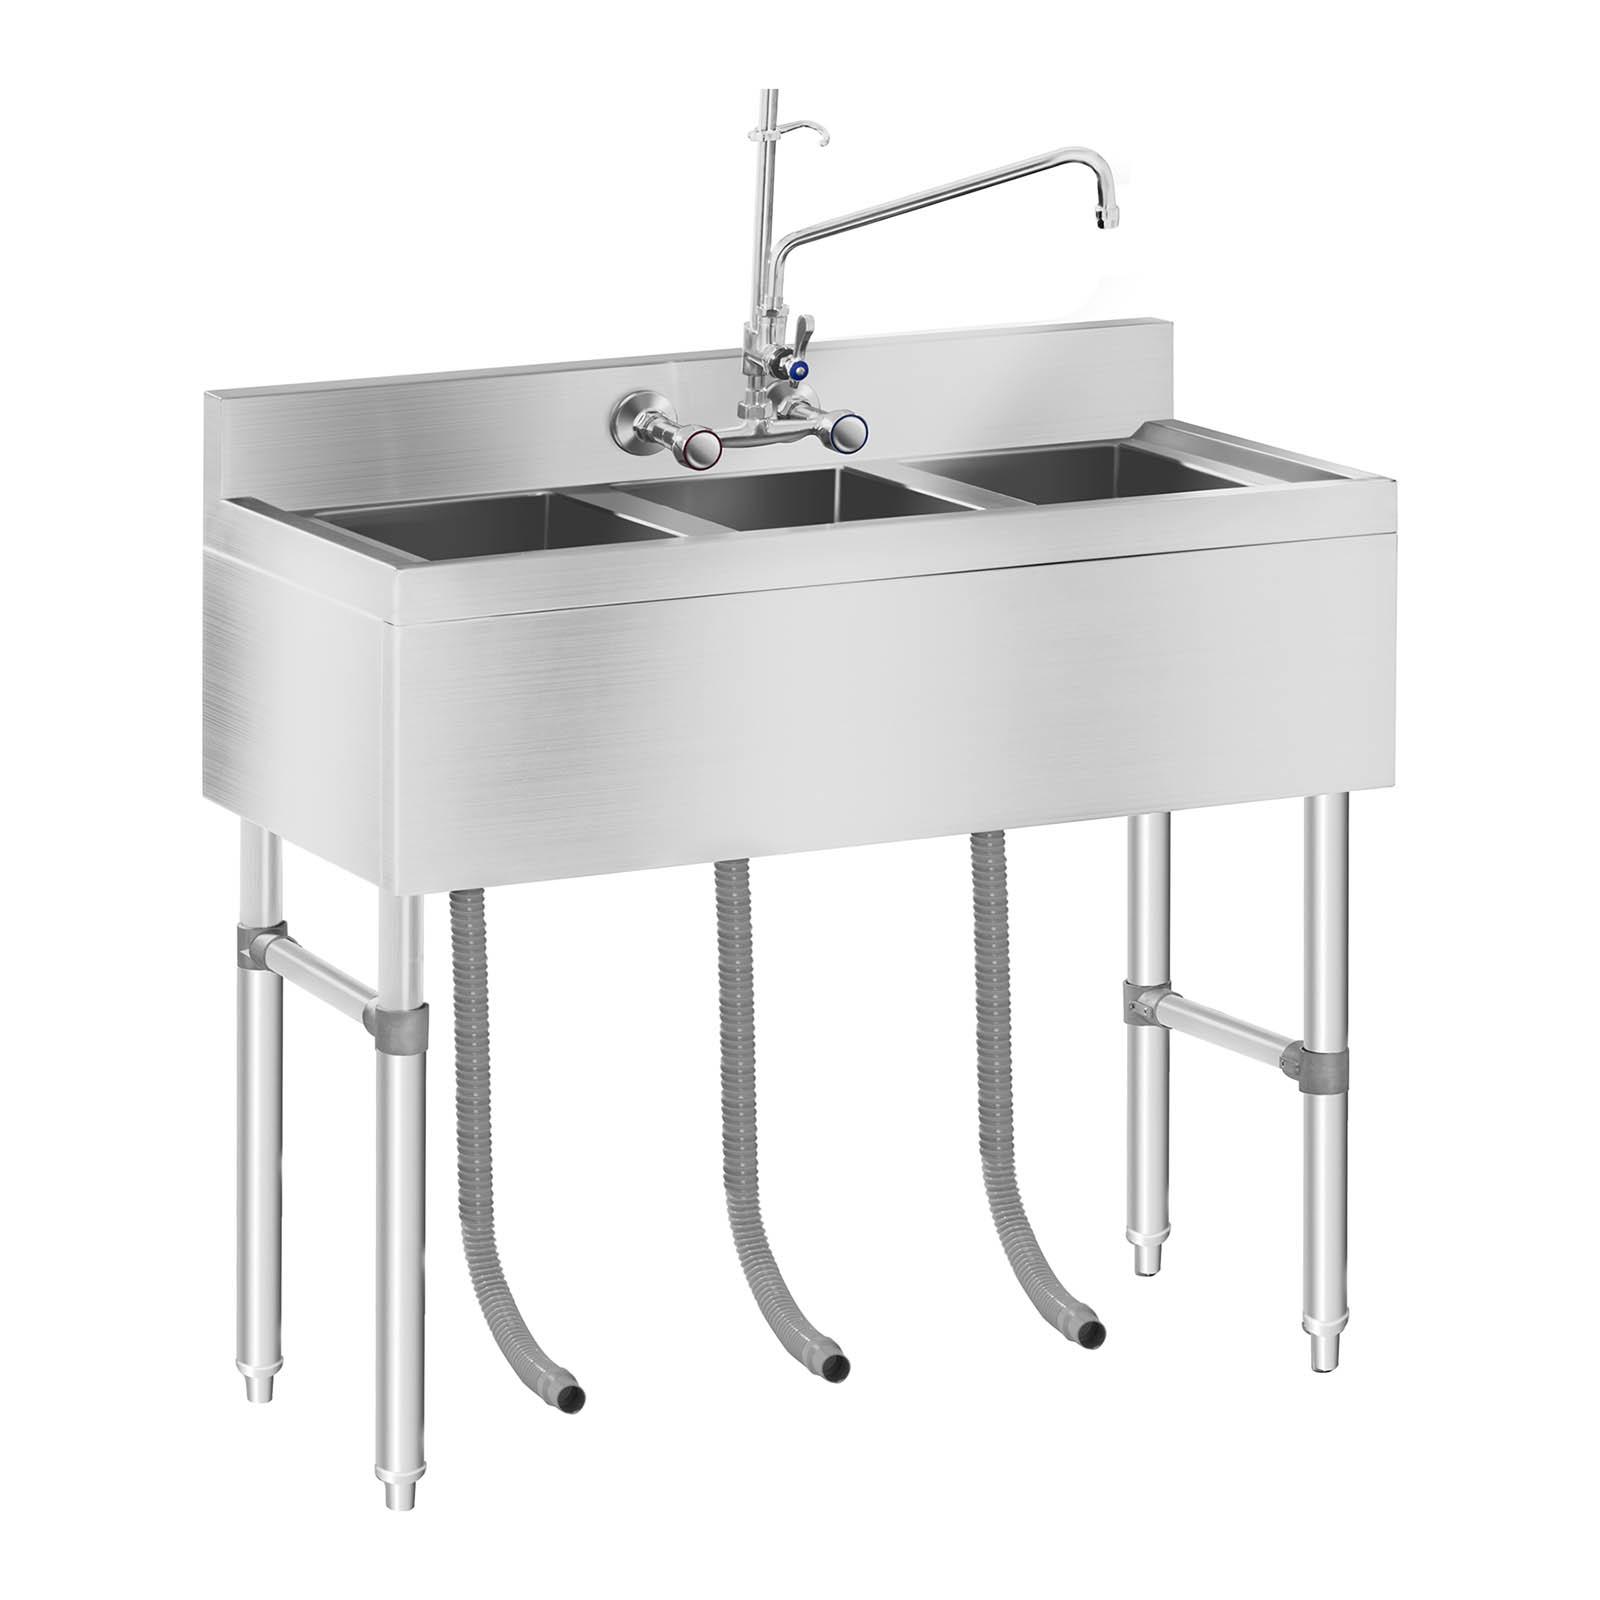 Industrial Kitchen Sink: COMMERCIAL KITCHEN SINK THREE BASIN CATERING SINK